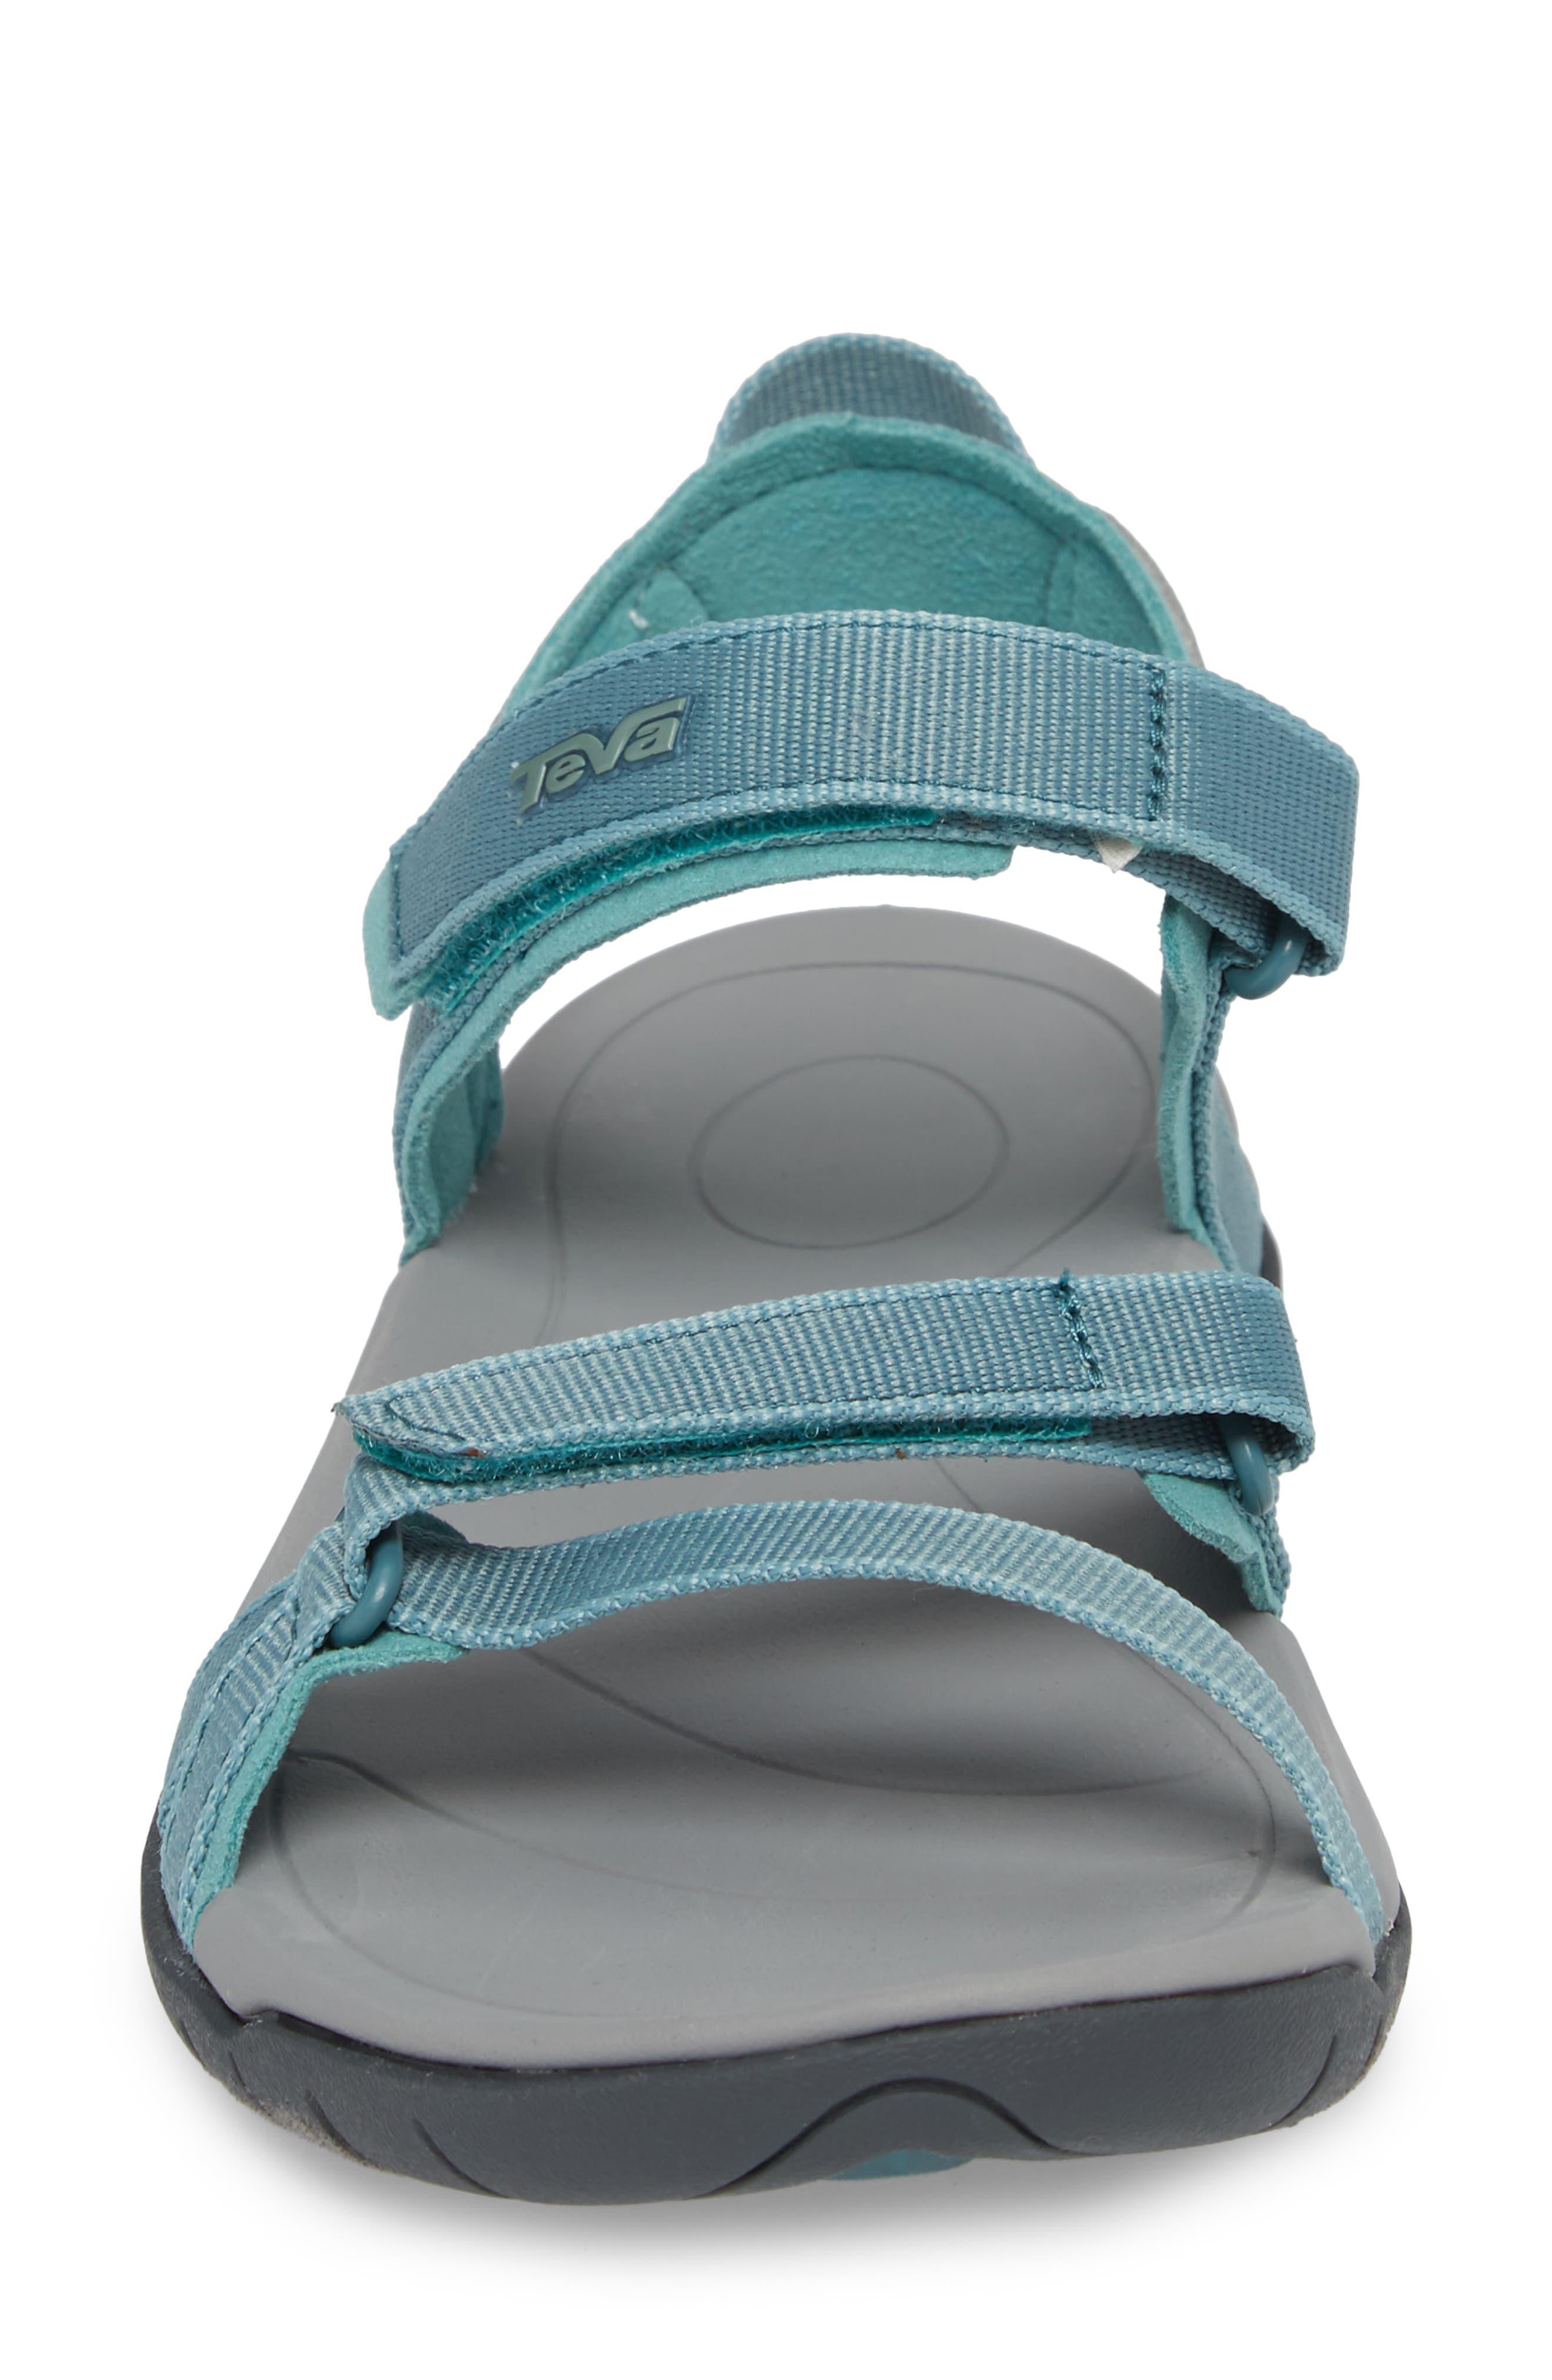 'Verra' Sandal,                             Alternate thumbnail 4, color,                             NORTH ATLANTIC